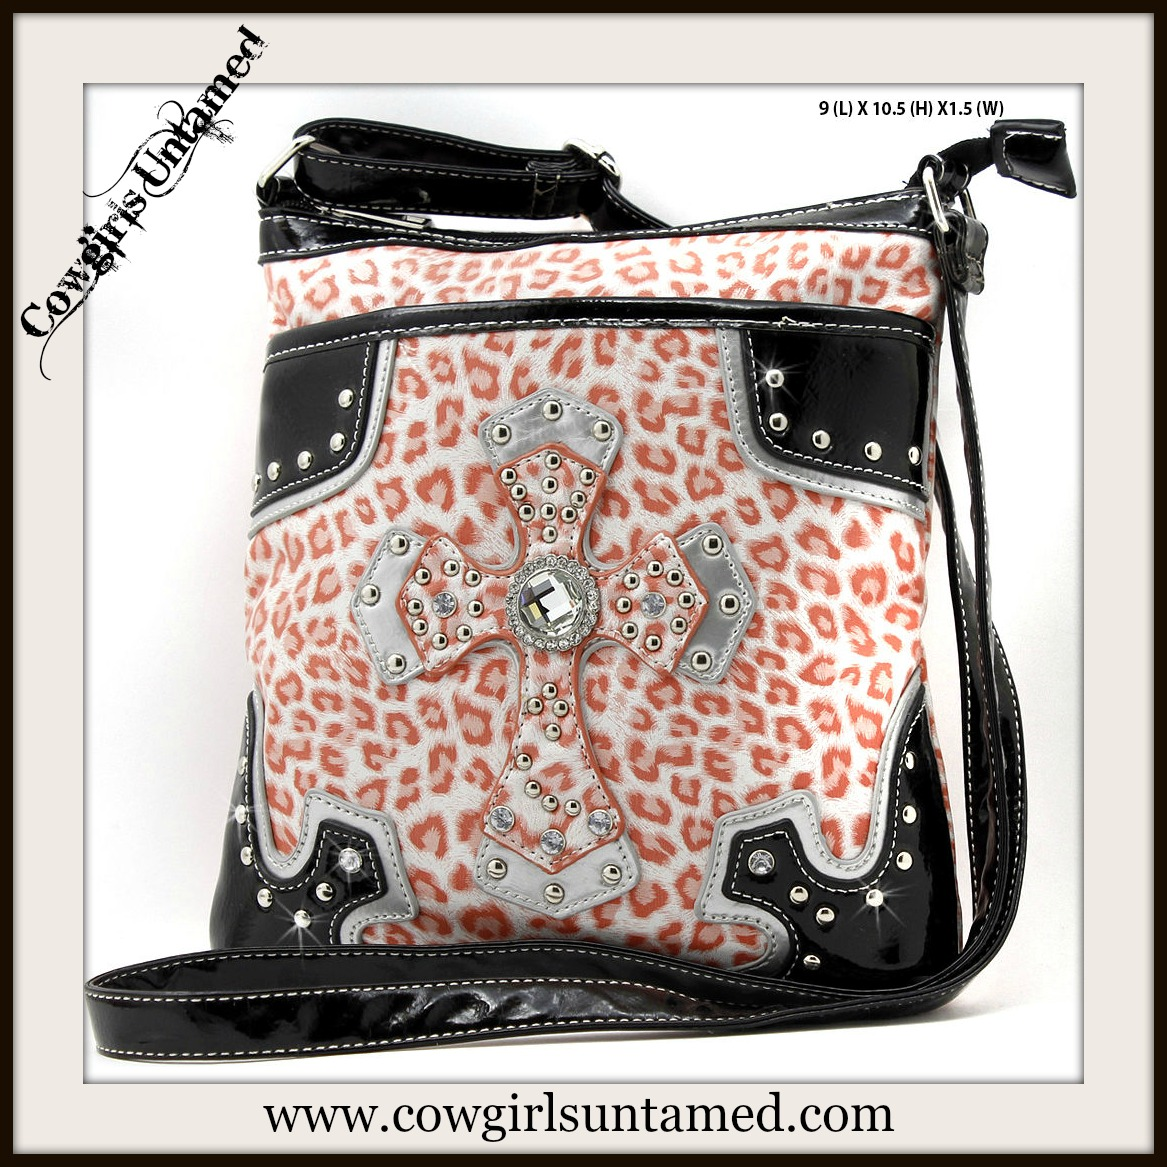 COWGIRL GLAM MESSENGER BAG Rhinestone Studded Cross on Orange Cheetah Leather Bag